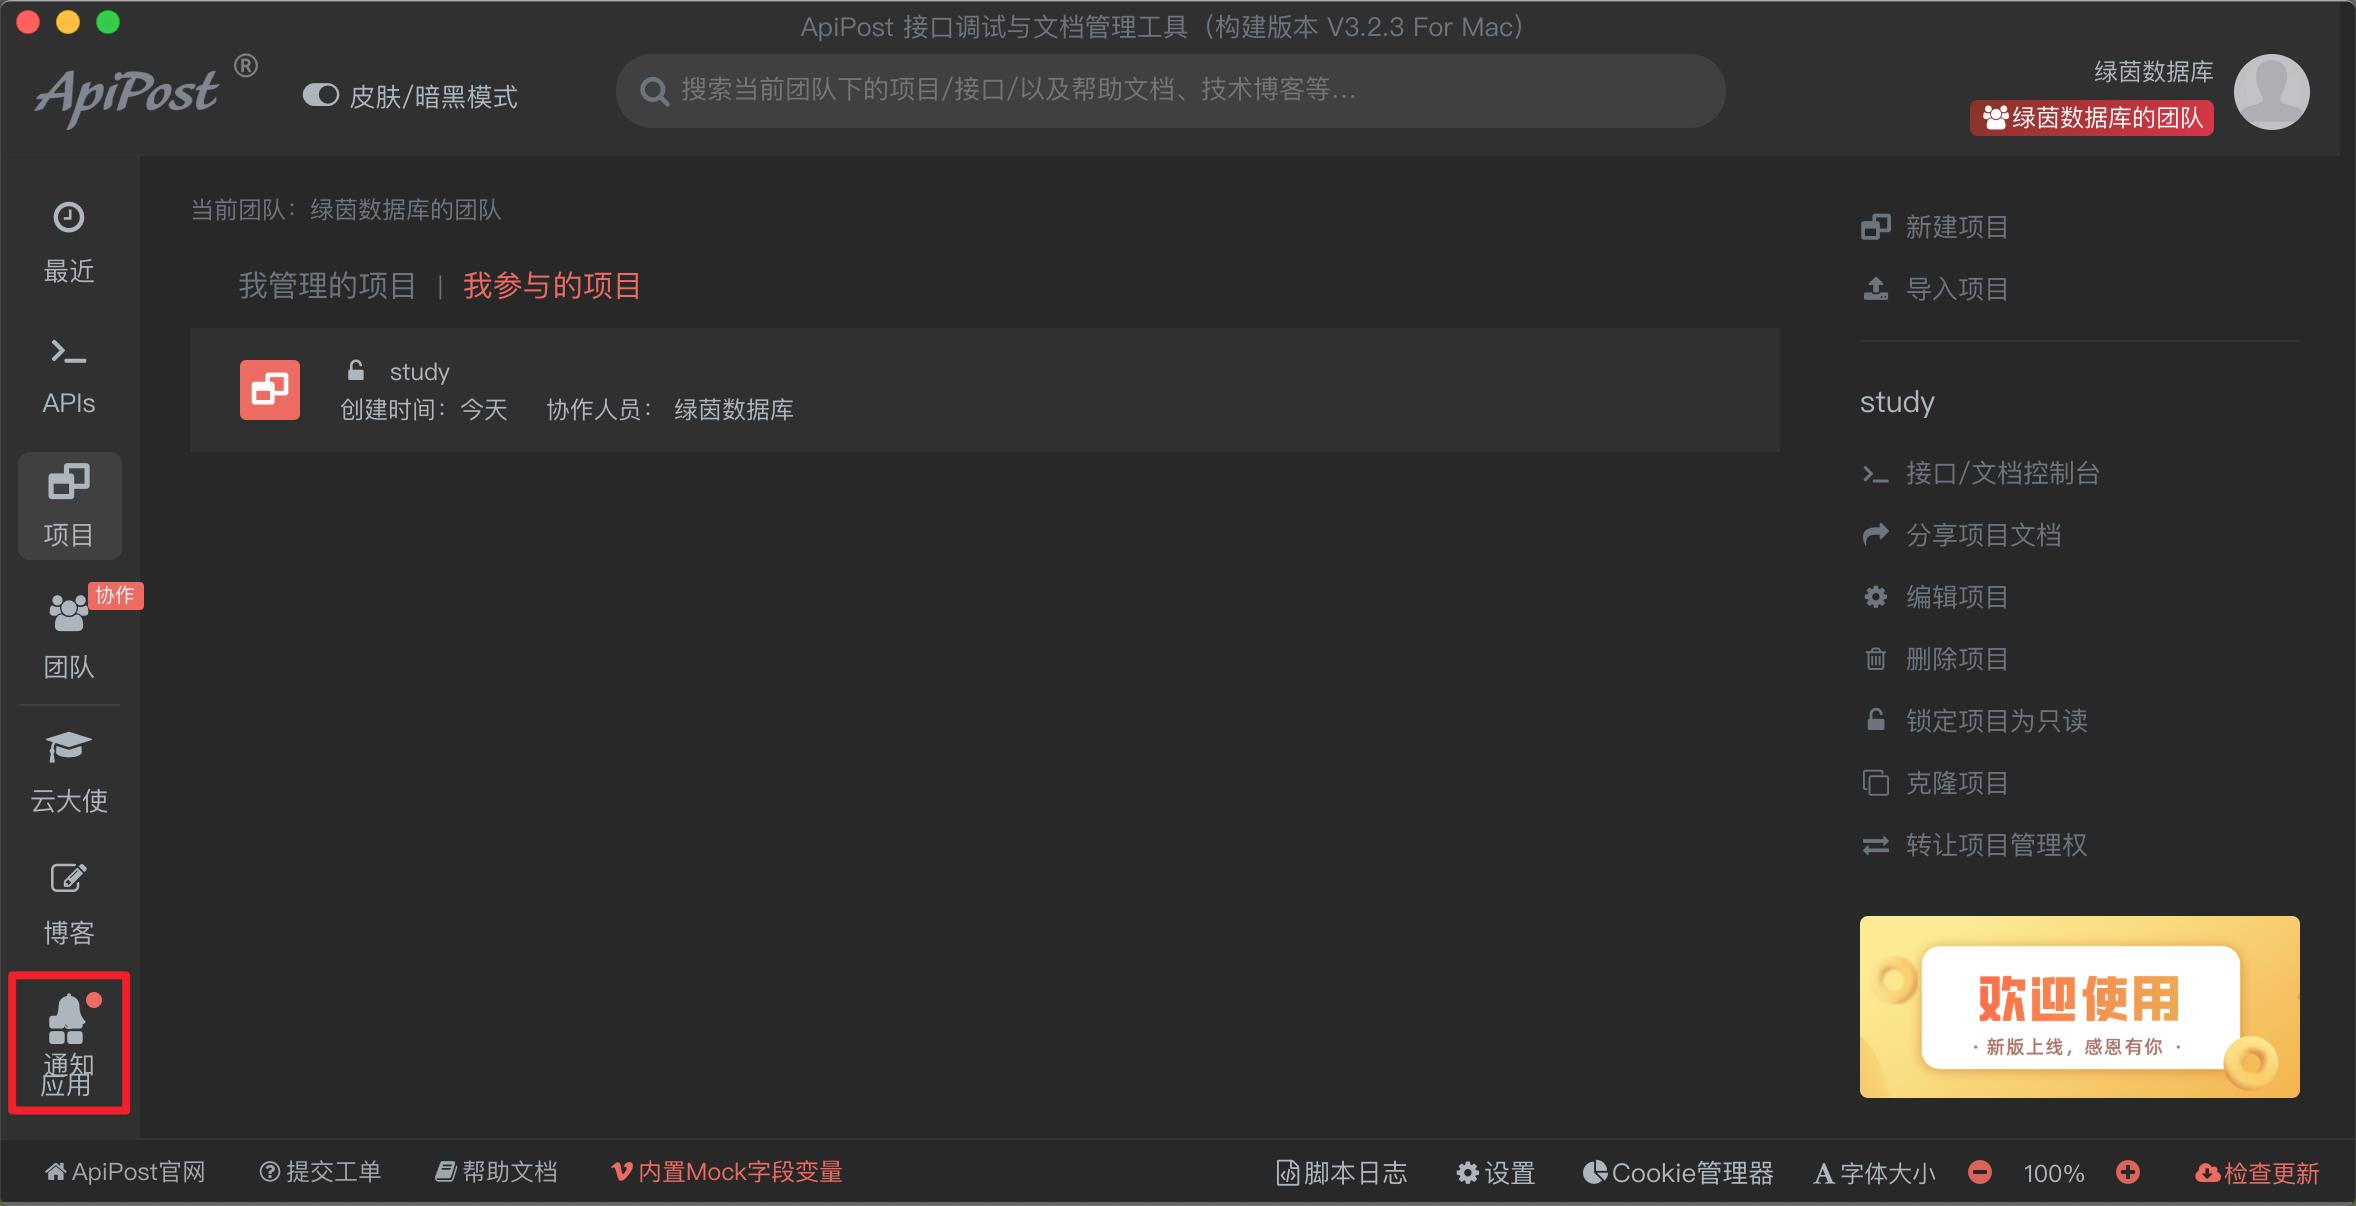 macbook页面未最大化UI样式问题,最大化后正常